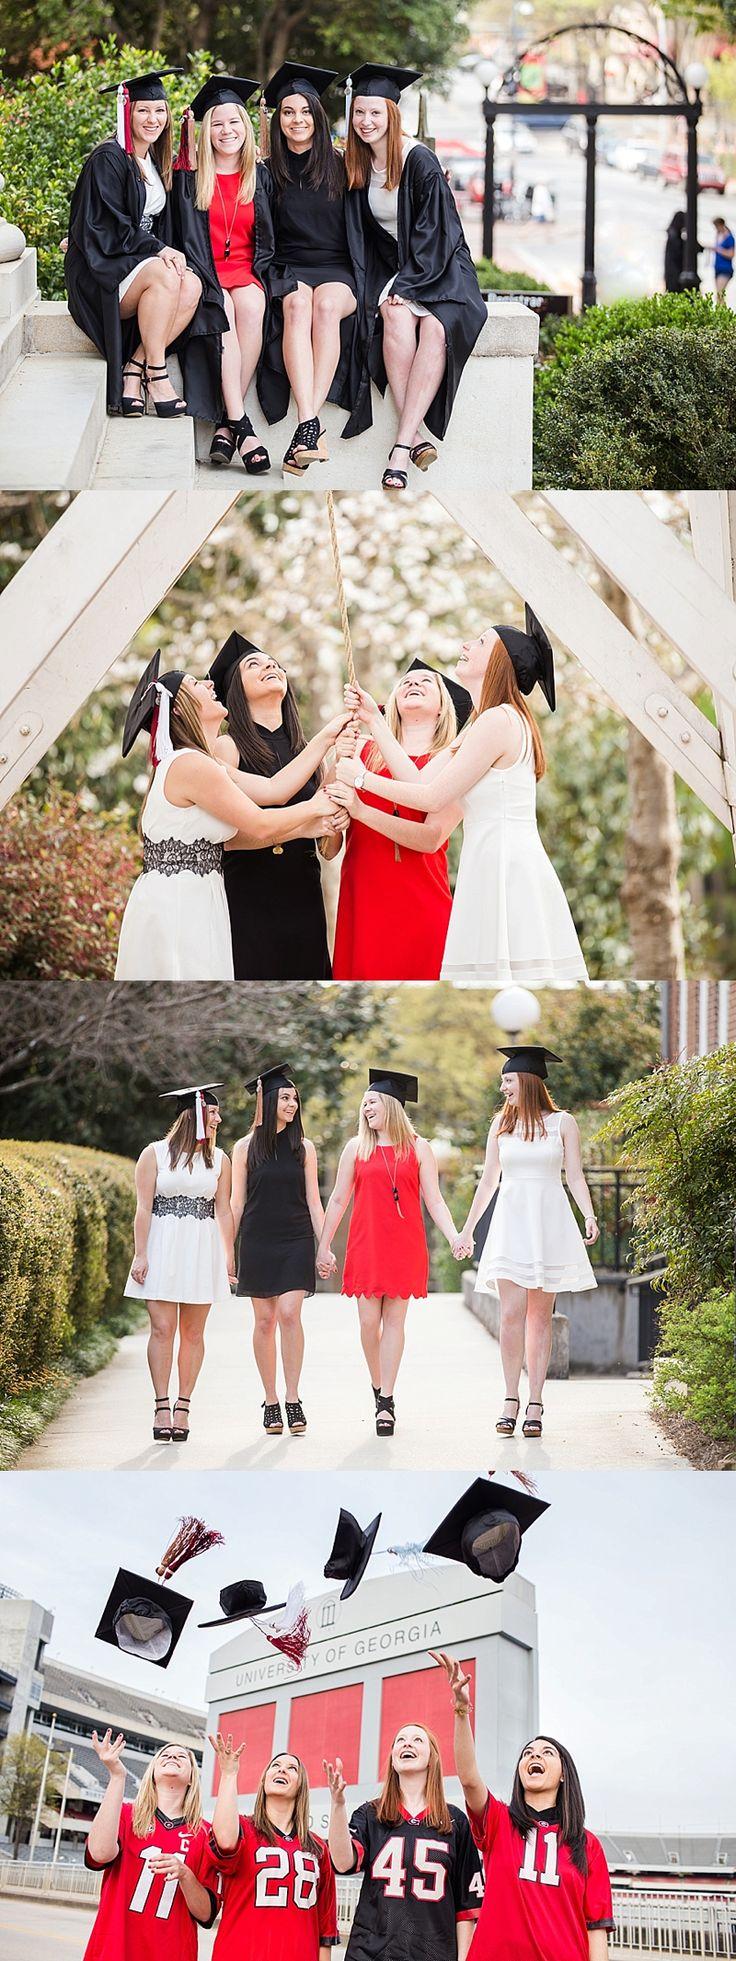 Senior session with your besties!!! :) University of Georgia | Delta Gamma sorority sisters | UGA Senior Graduation Photos | Athens GA Photographer